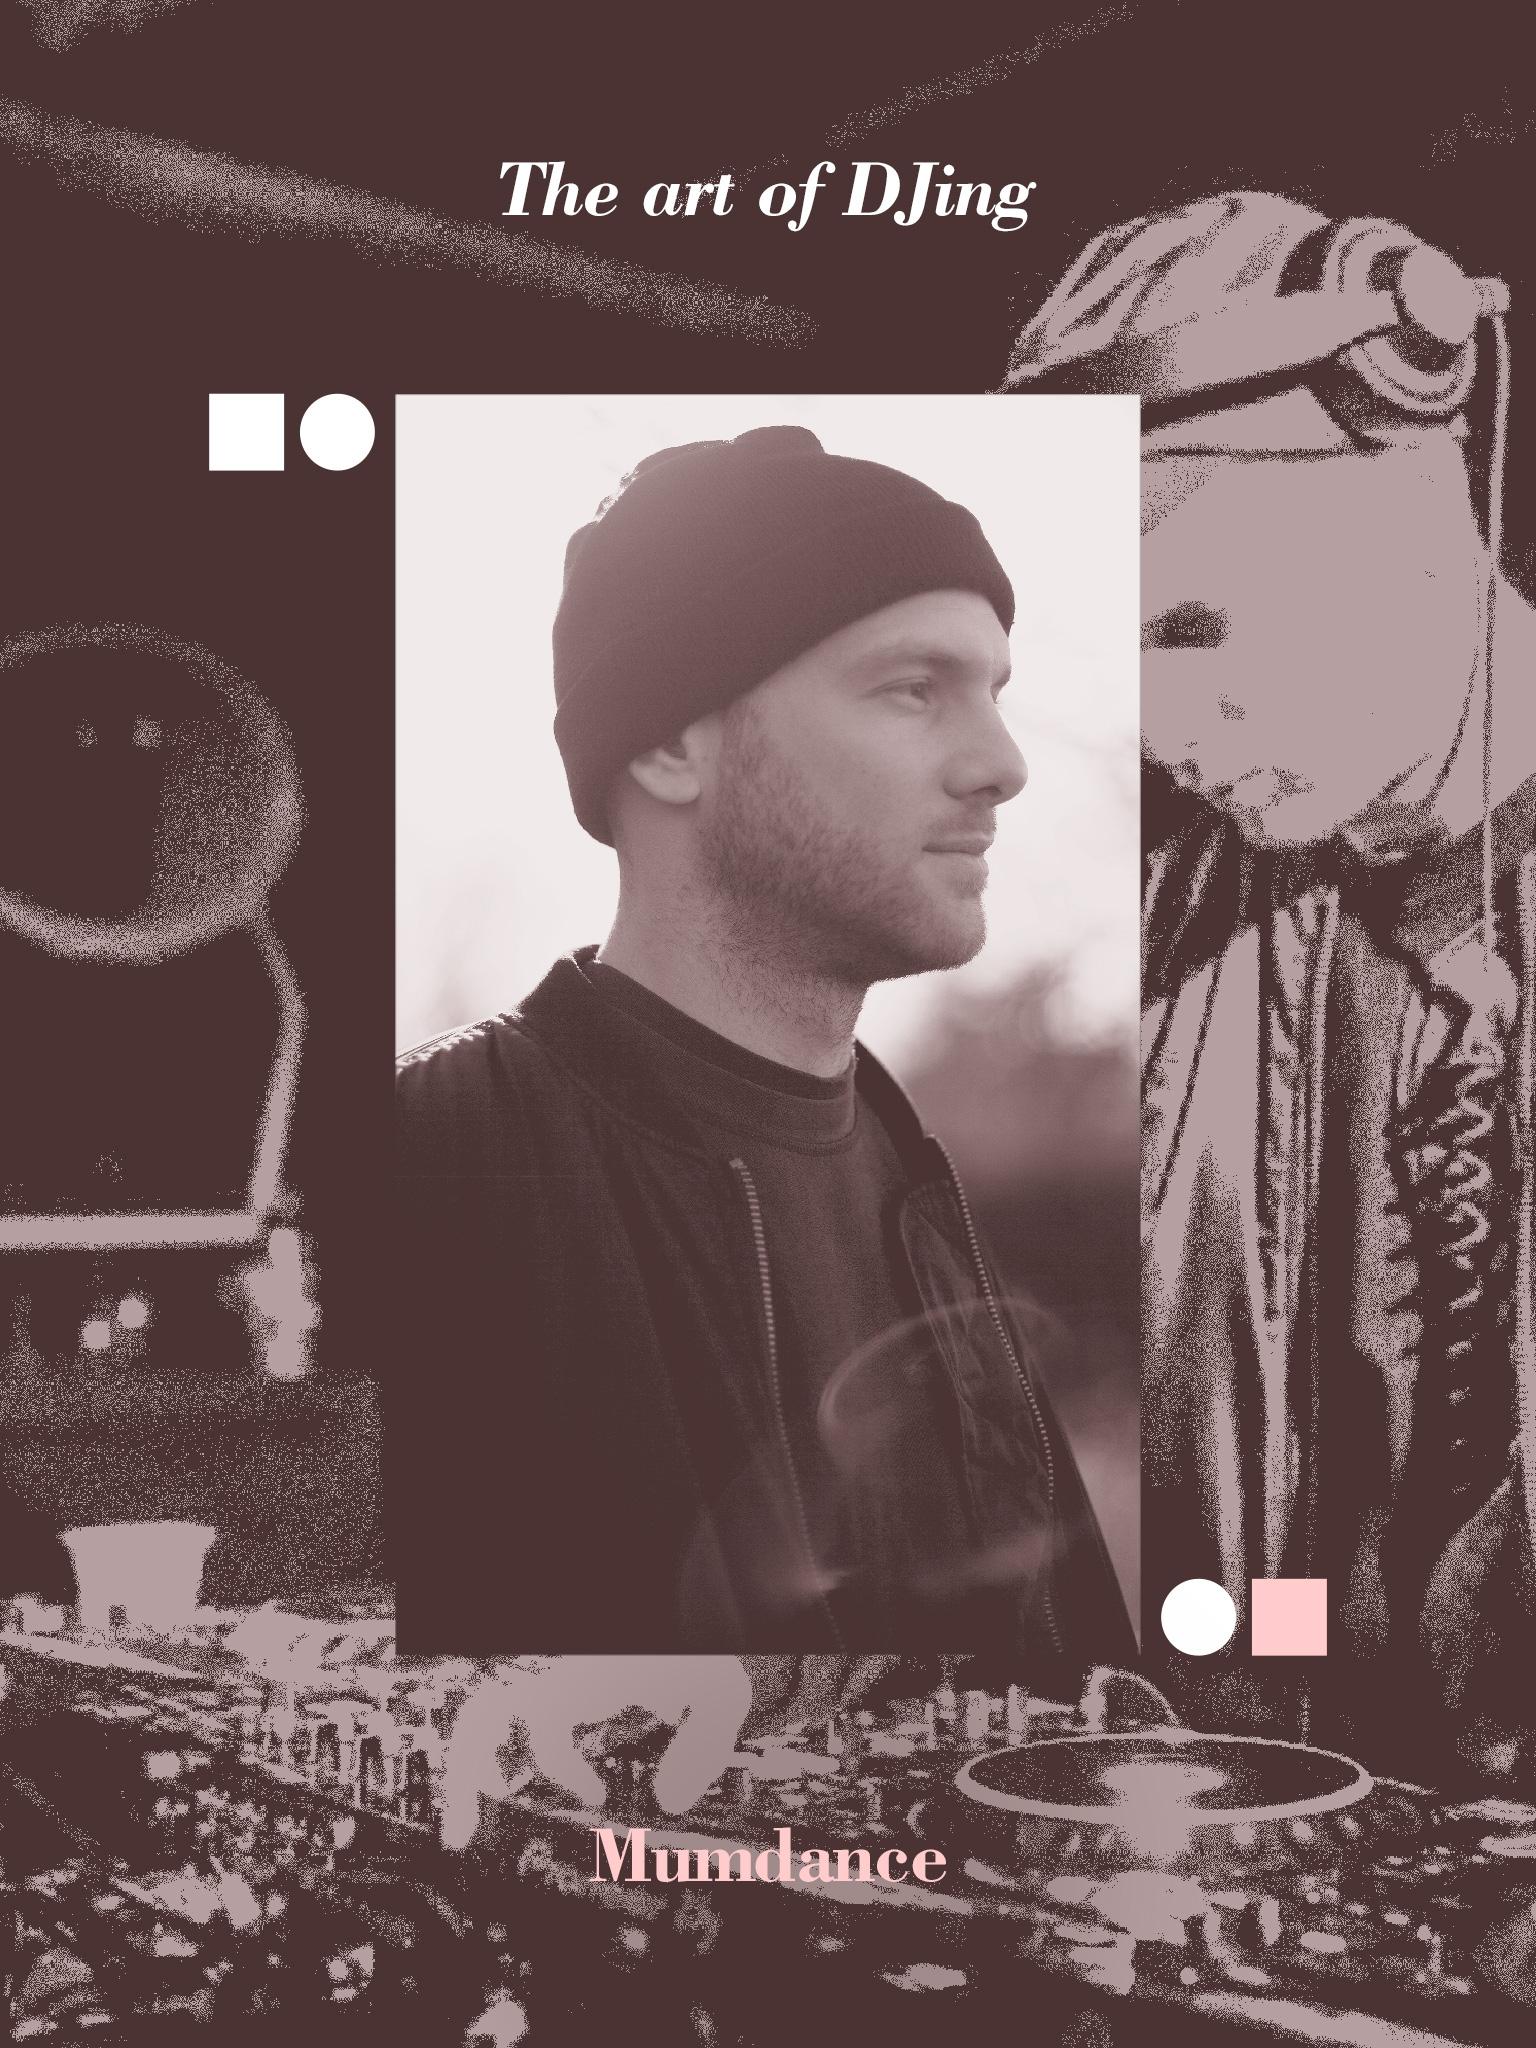 RA: The art of DJing: Mumdance